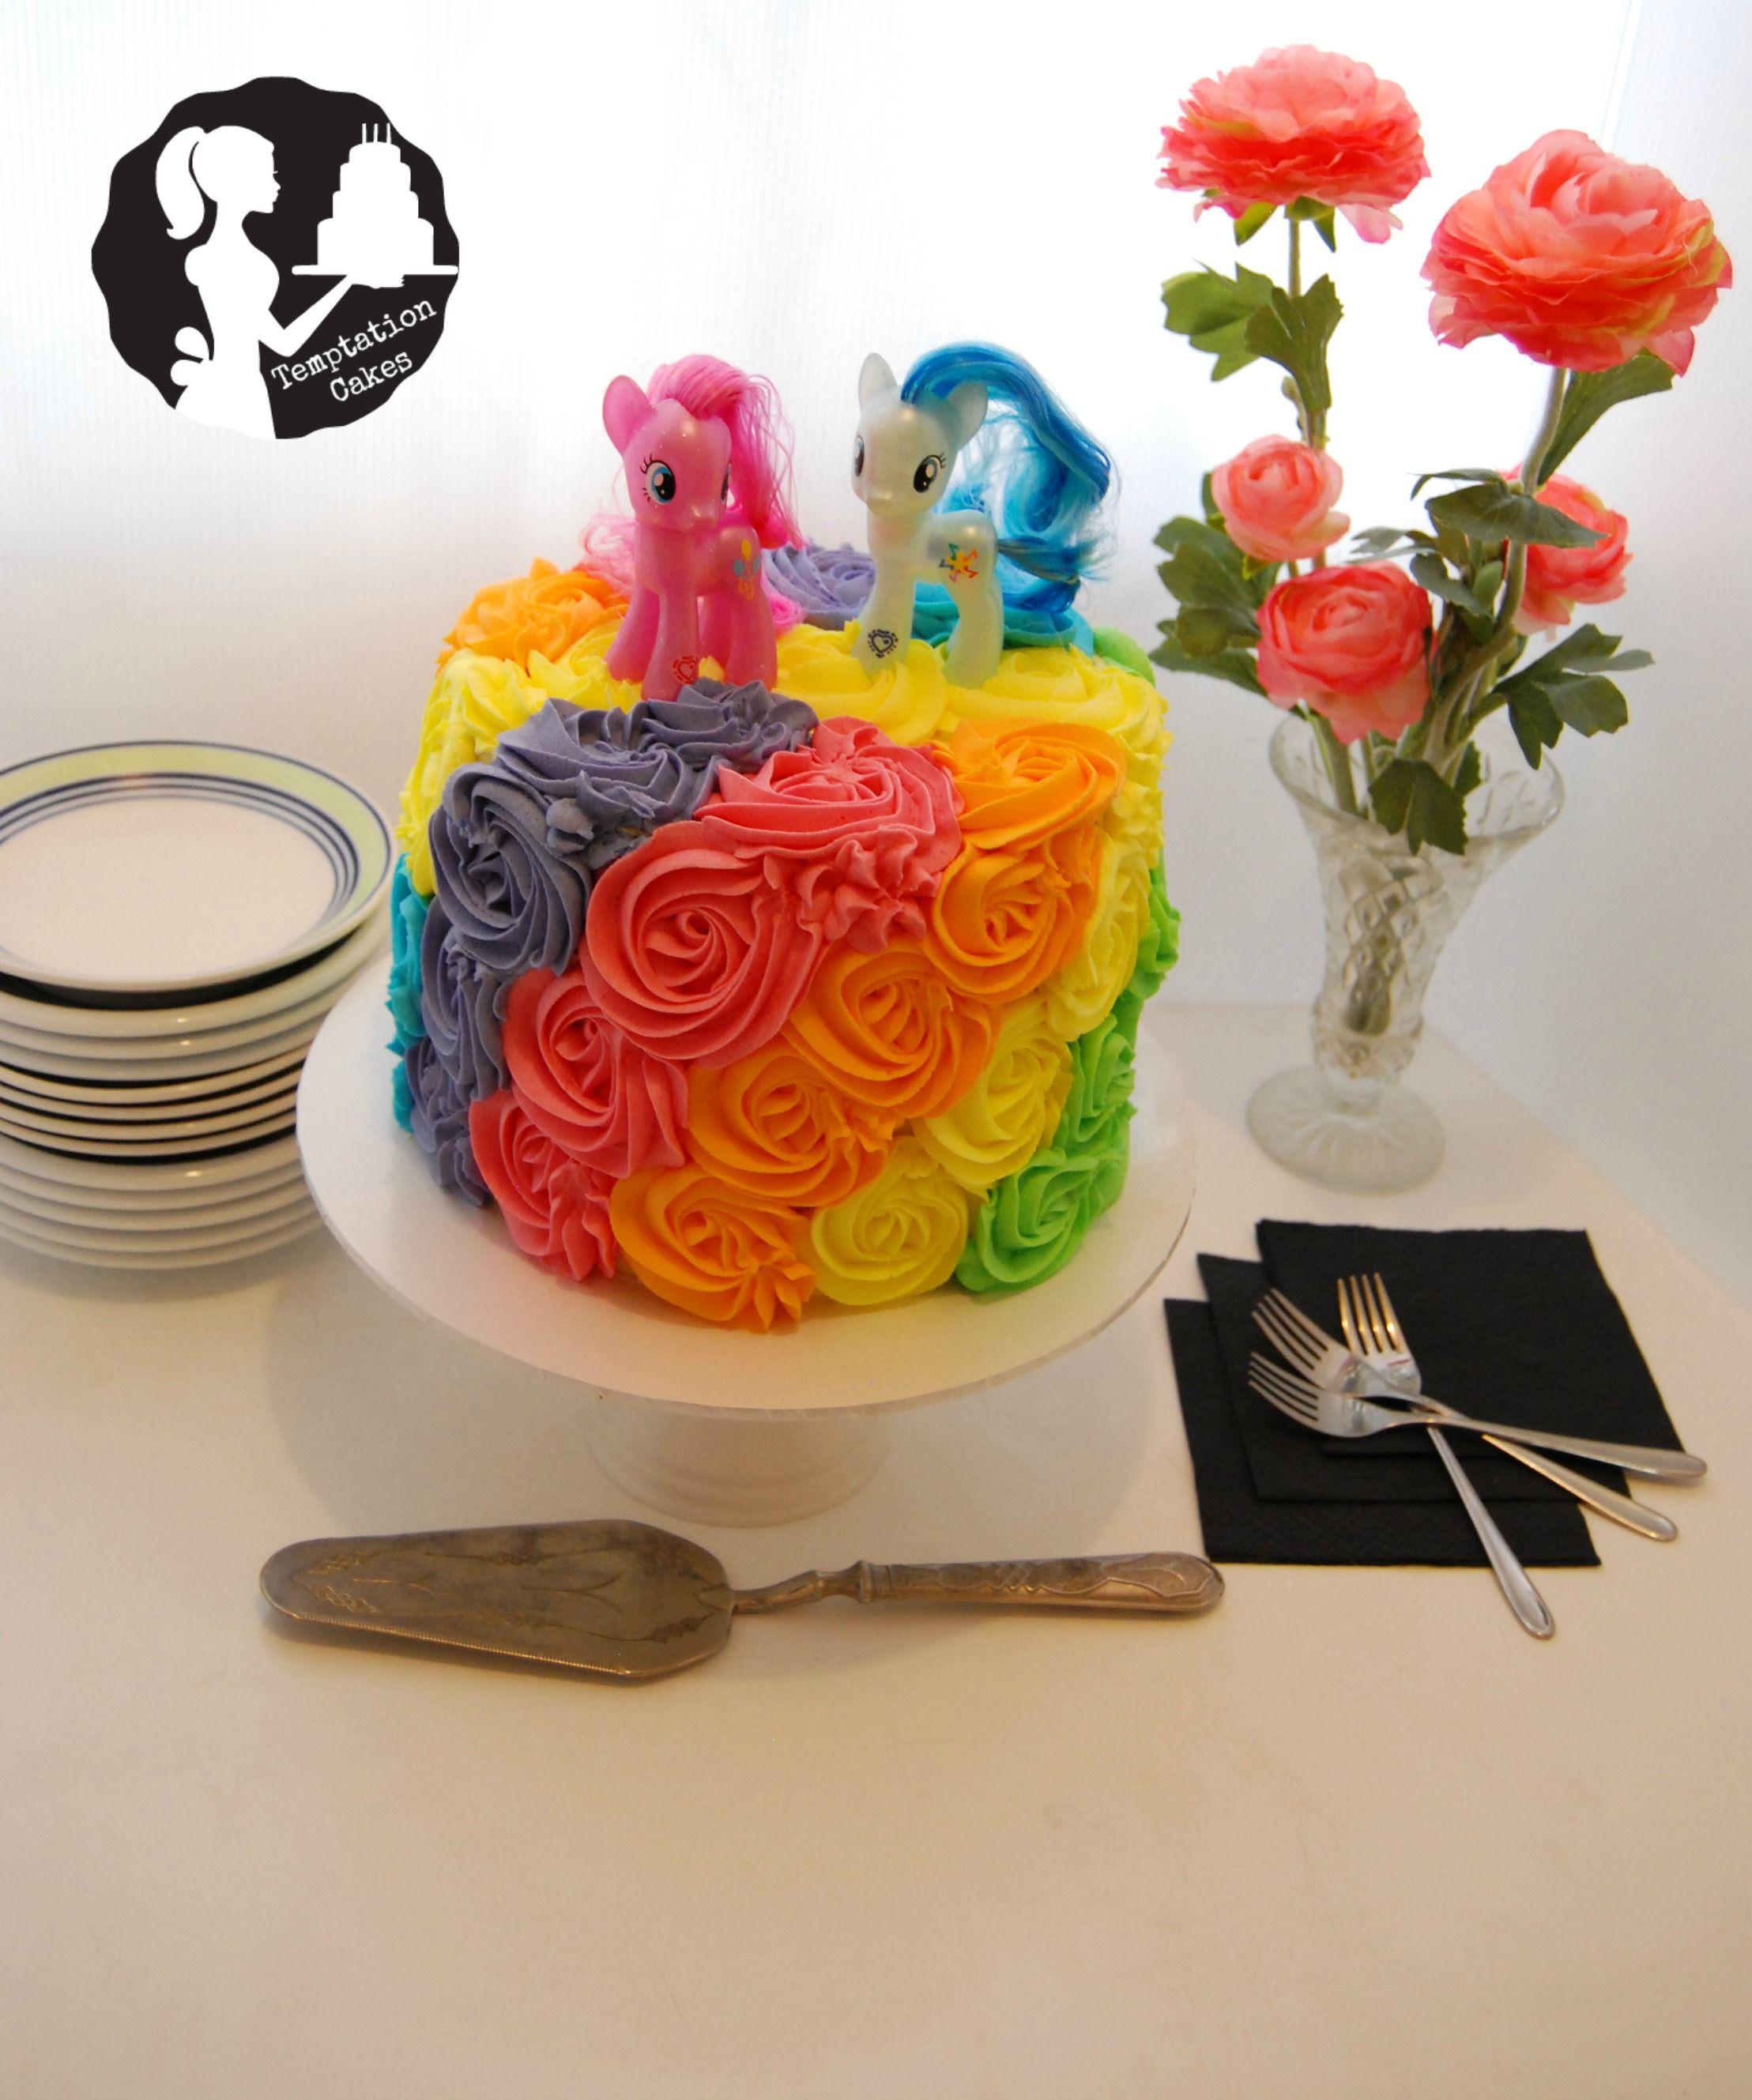 My Little Pony Cake Auckland $195